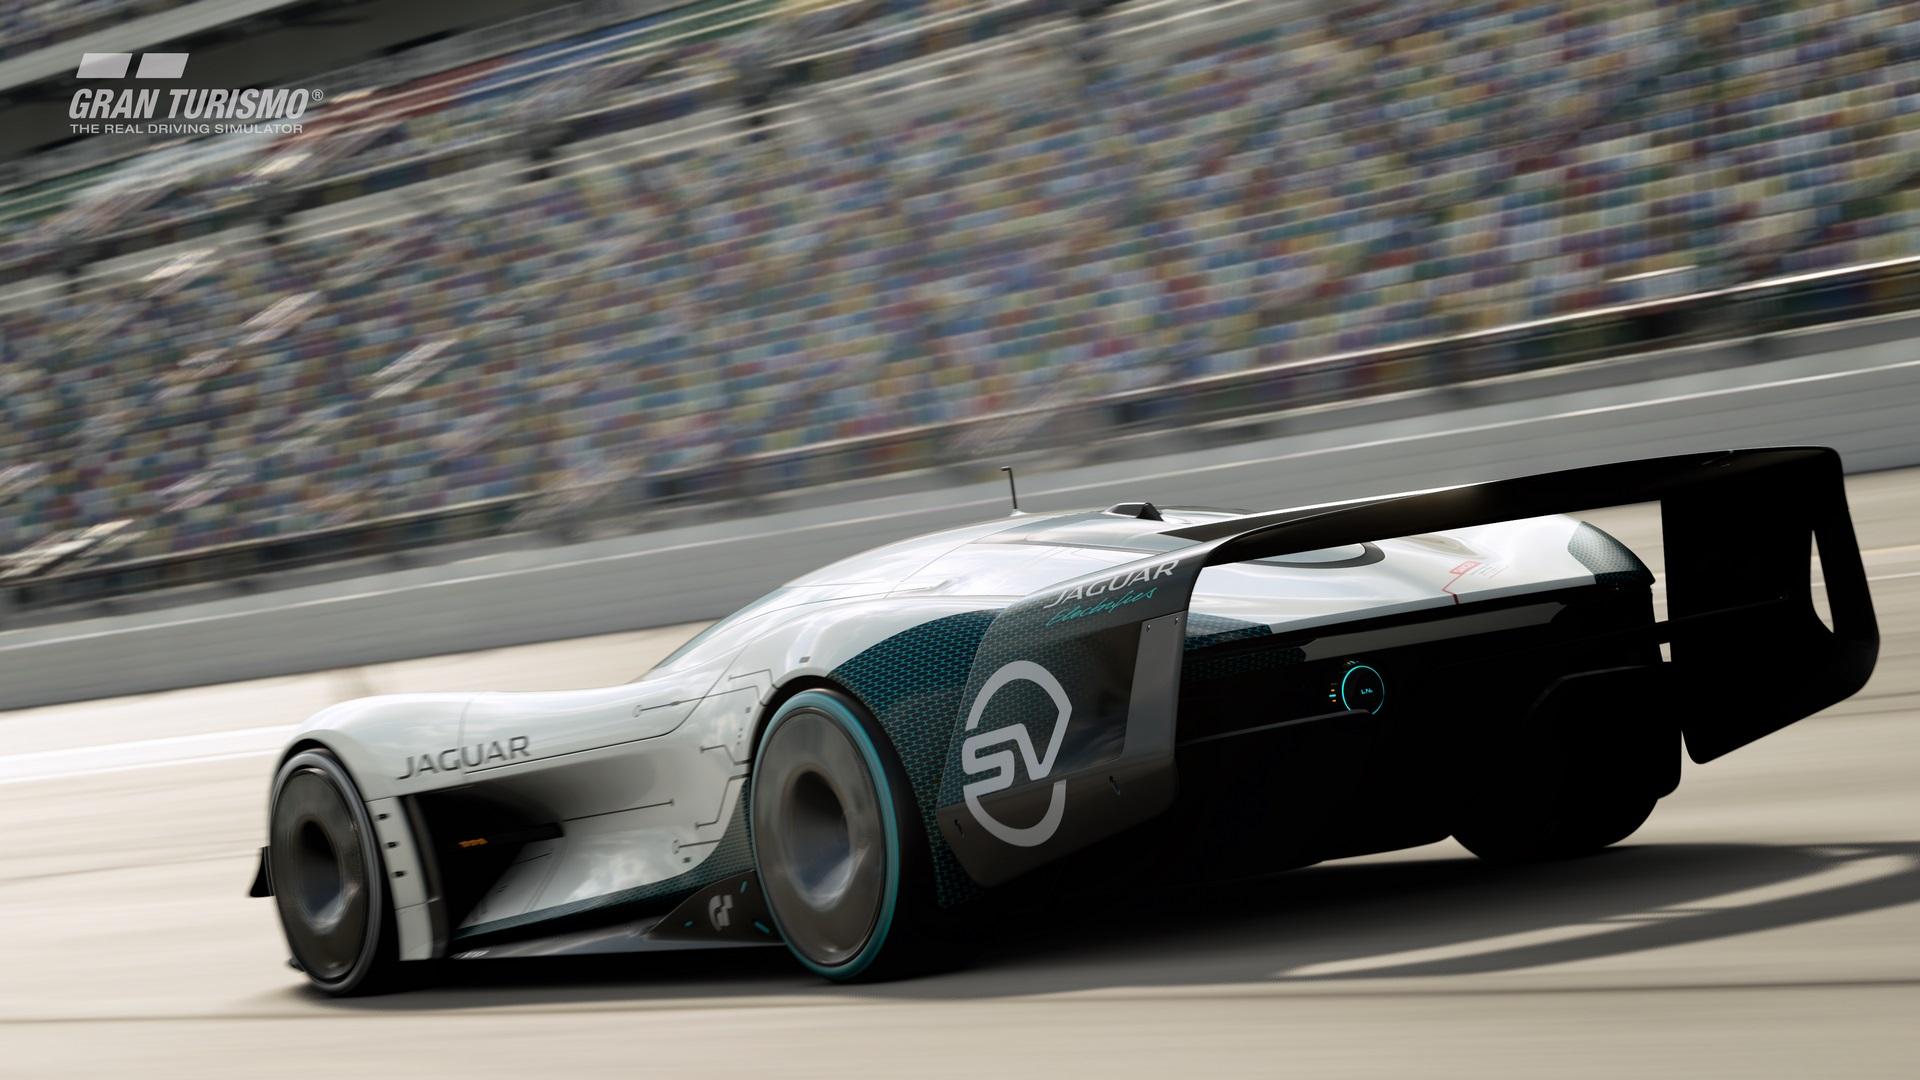 Jaguar-Vision-Gran-Turismo-SV-9